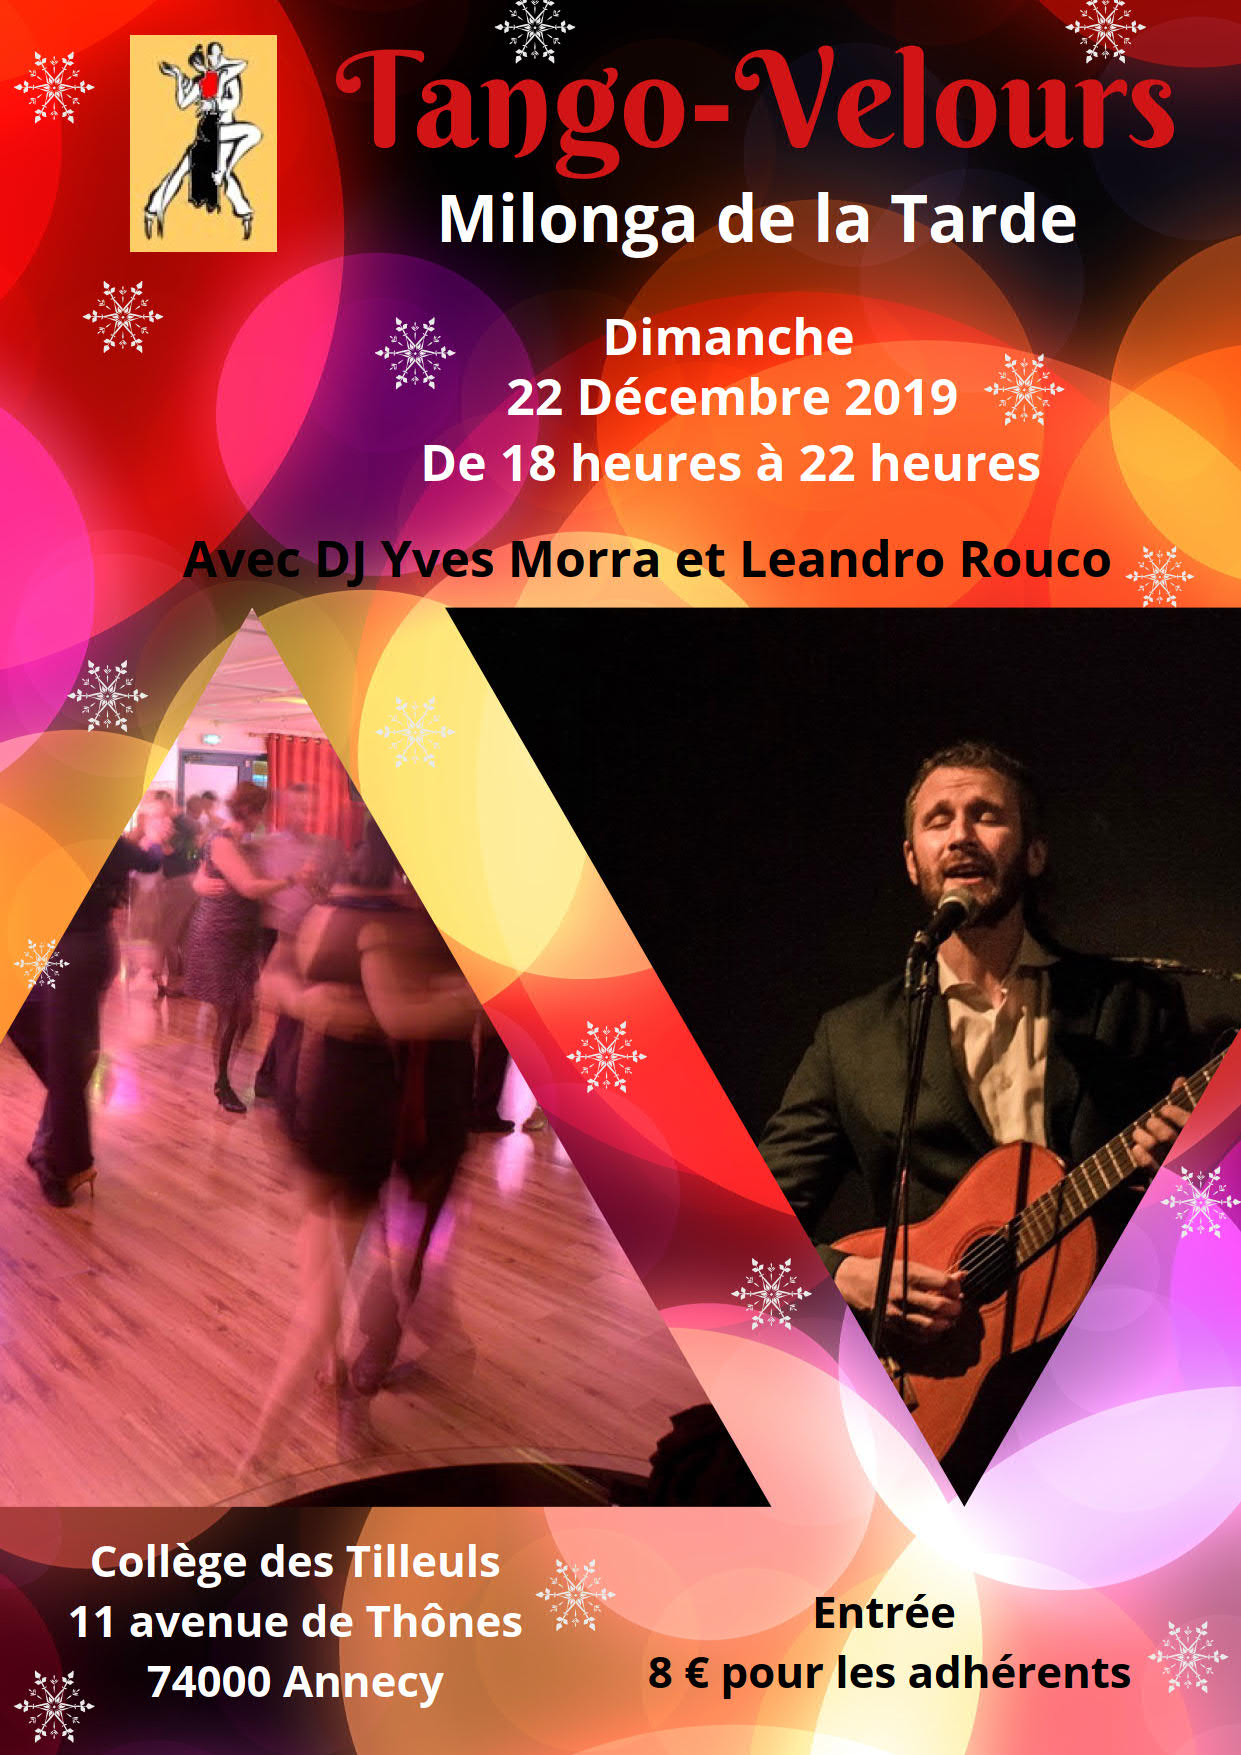 milonga de la Tarde, avec D.J. Yves Morra et Leandro Rouco